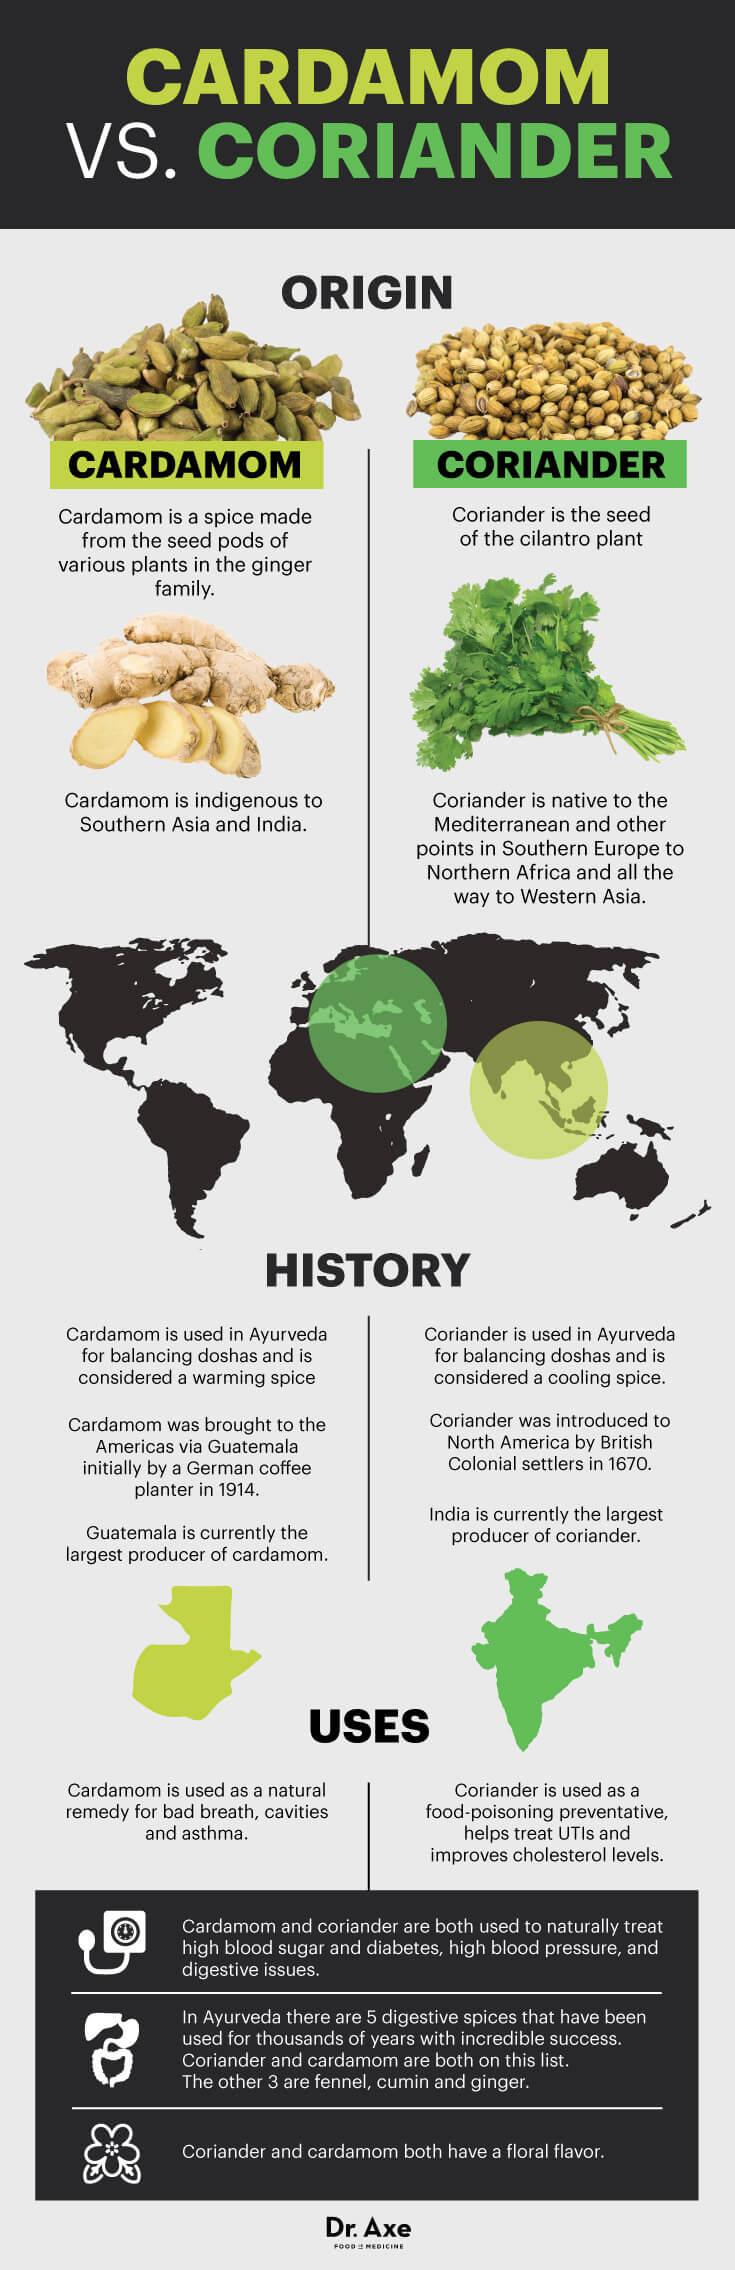 Cardamom vs. coriander - Dr. Axe